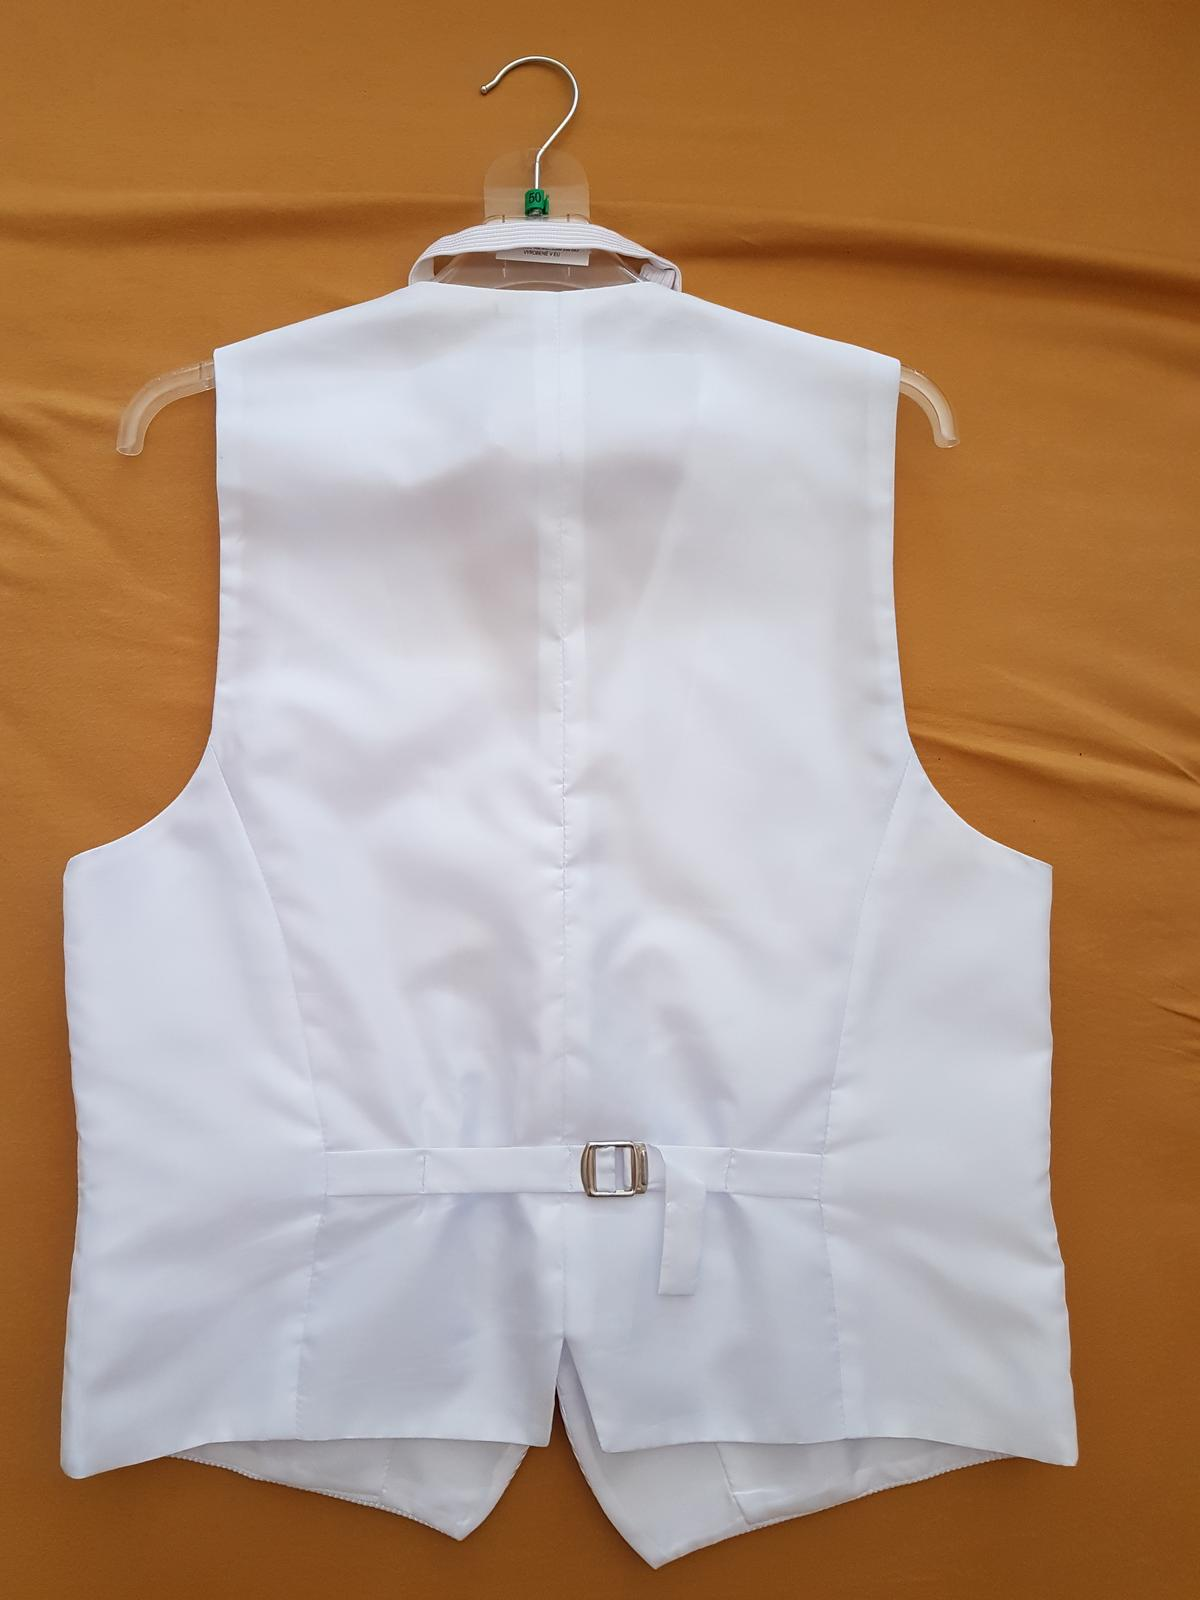 Biela vesta s motýlikom a kapesníkom - Obrázok č. 2